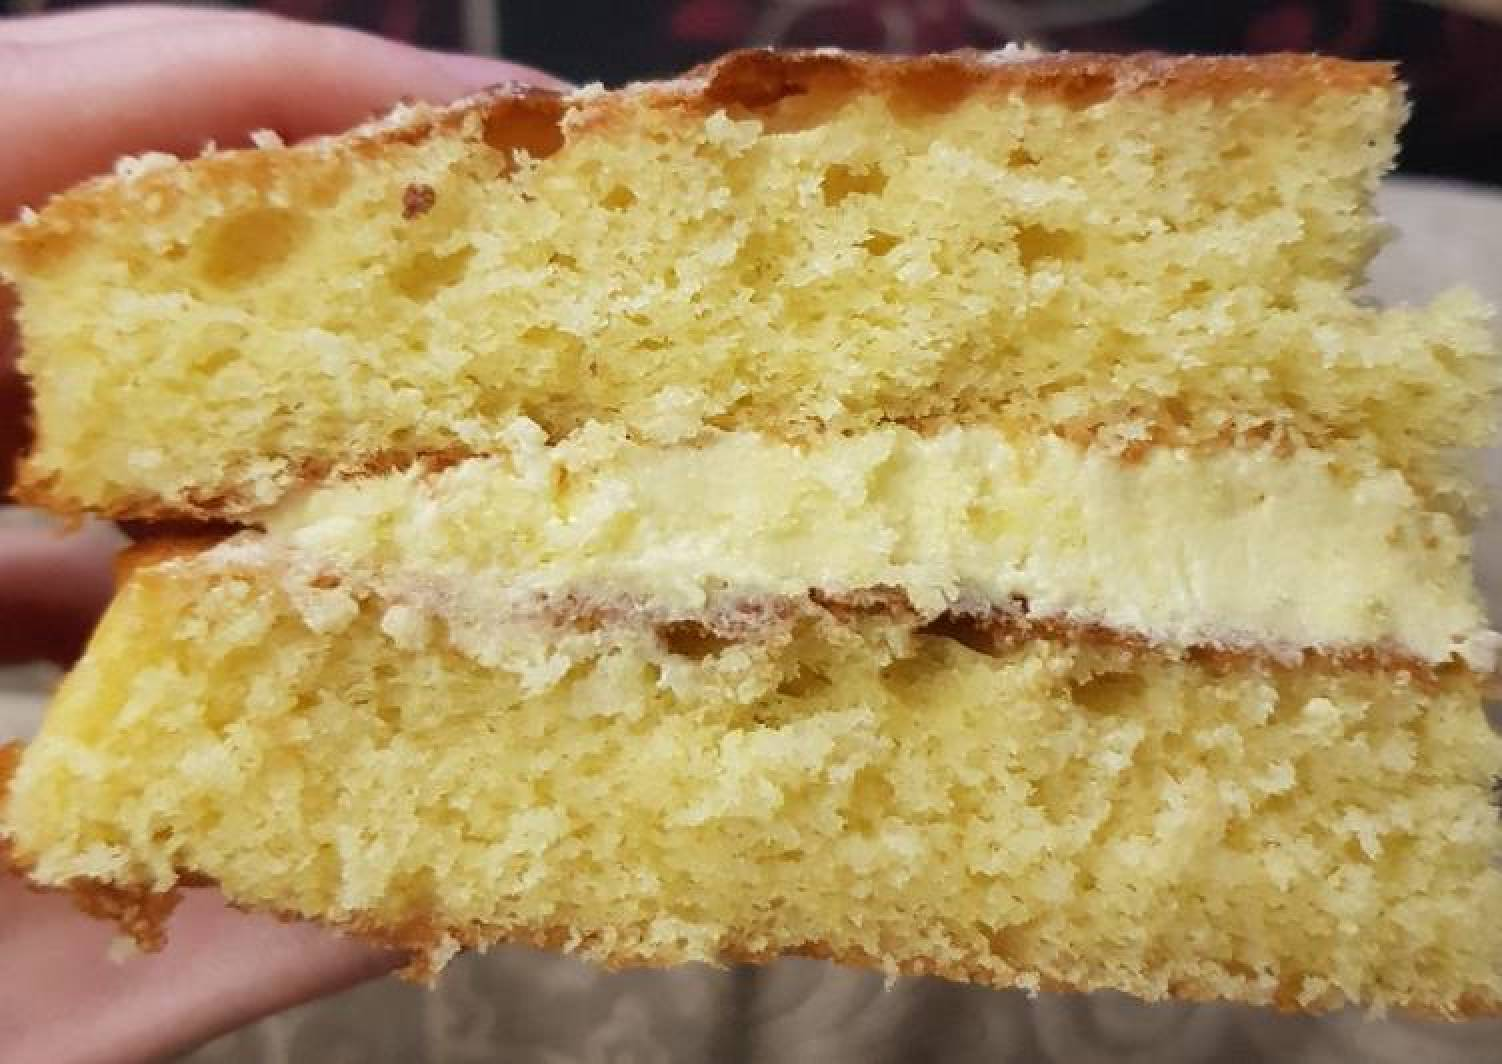 Lime sponge cake